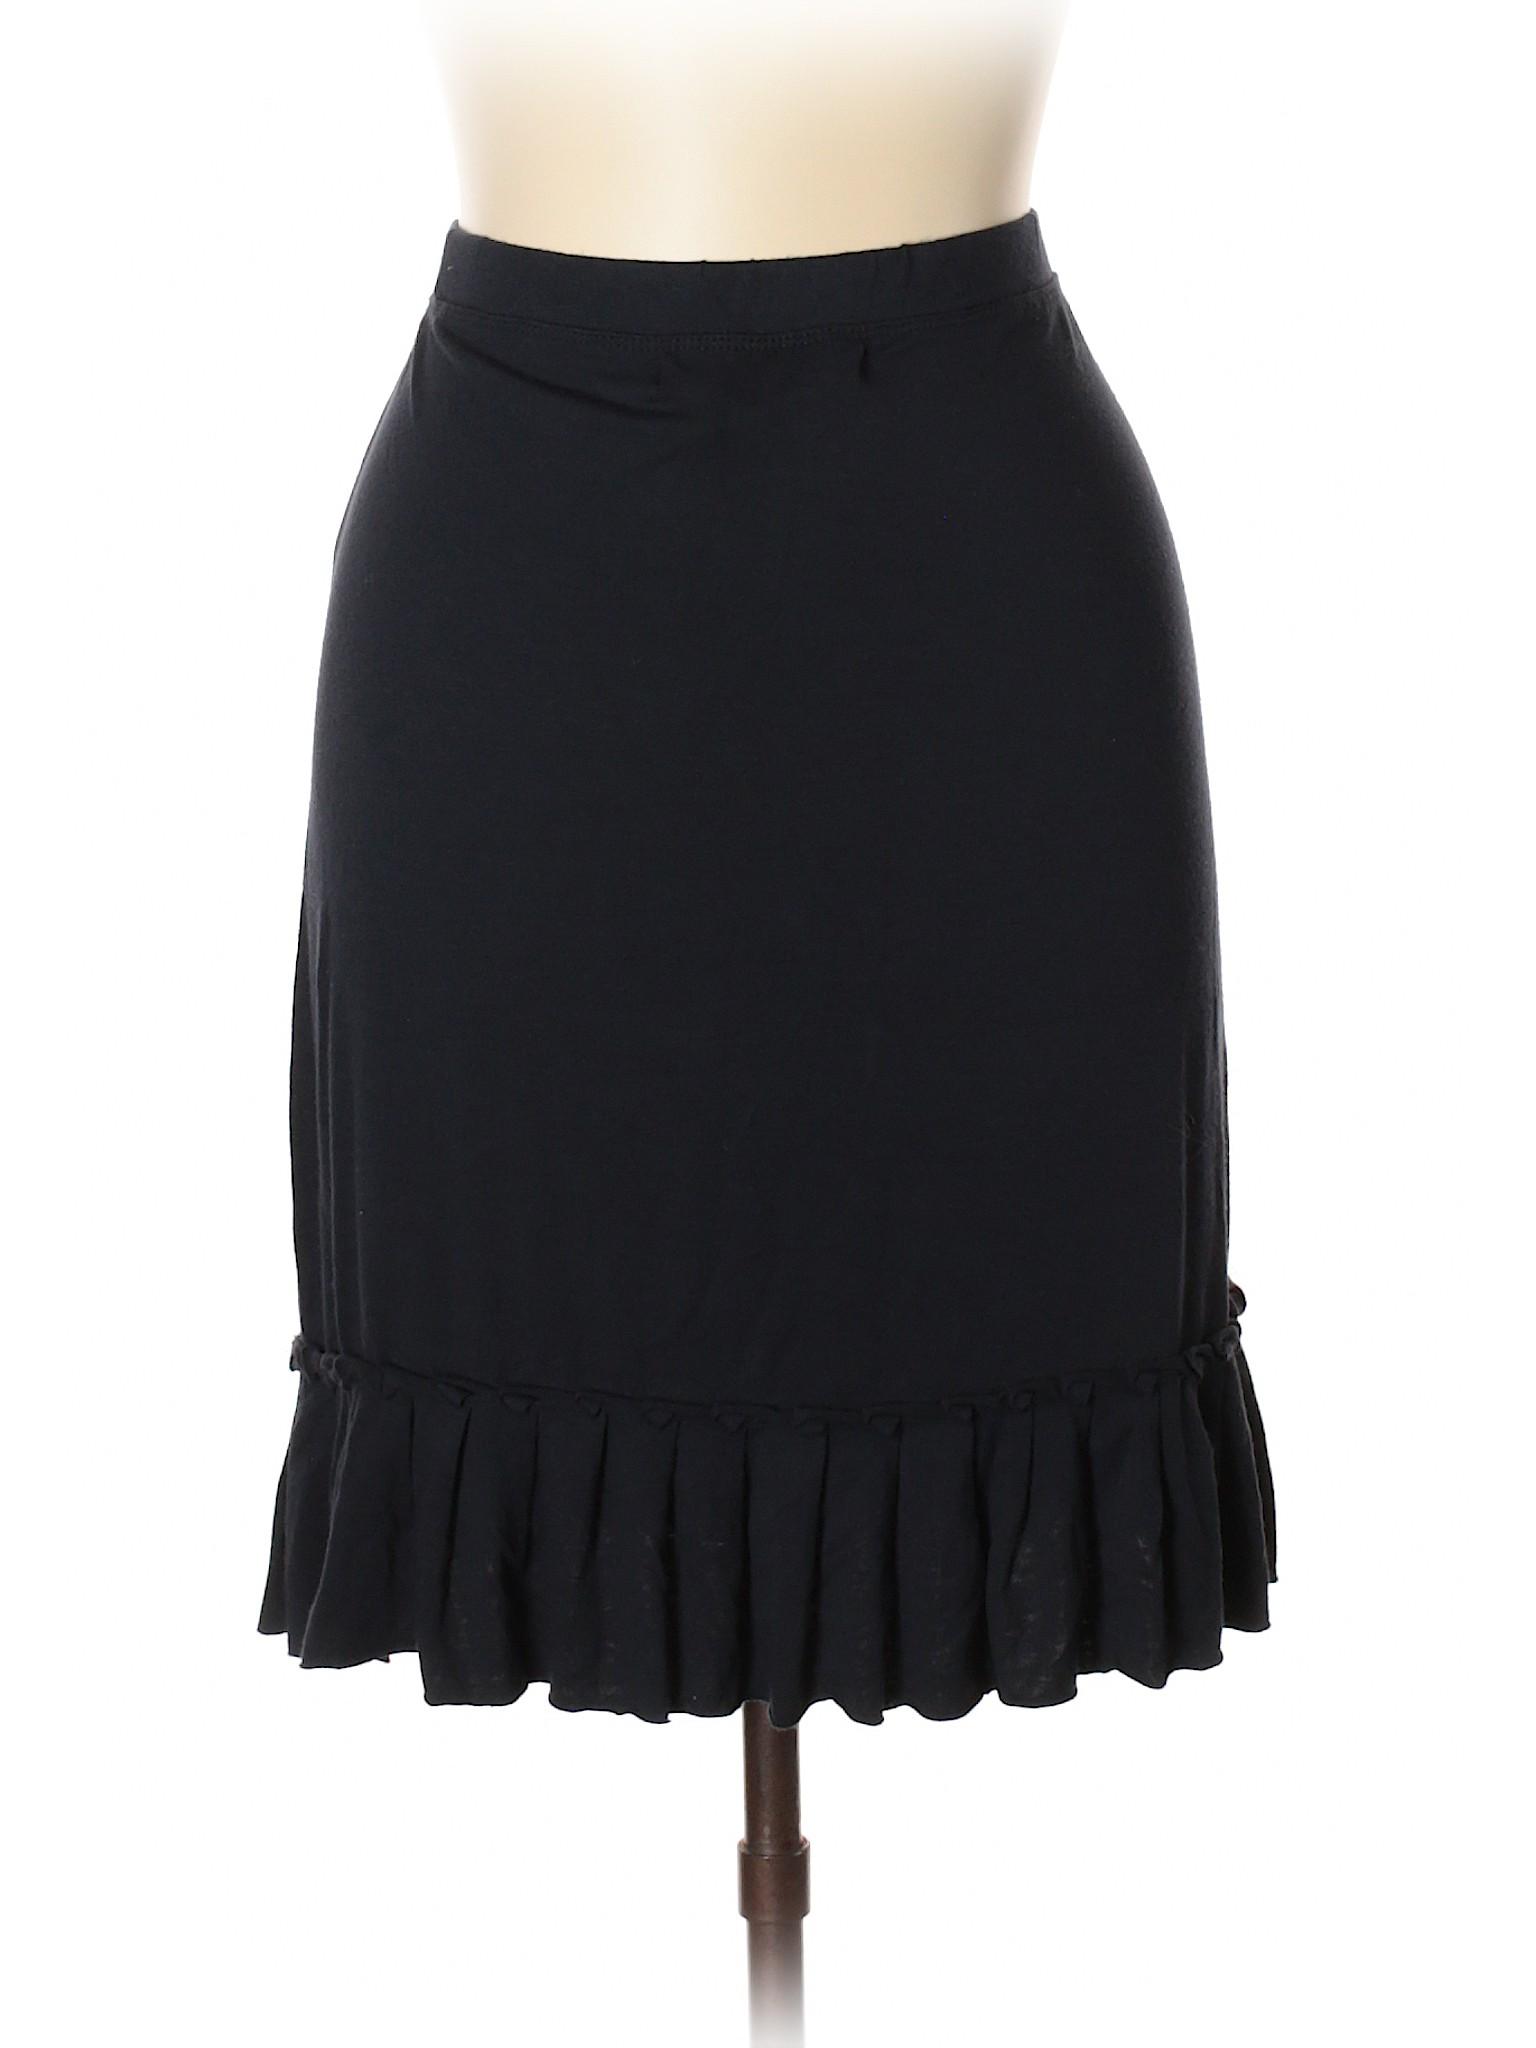 Boutique Boutique Skirt Casual Casual Boutique Casual Boutique Casual Skirt Skirt rRnCrv